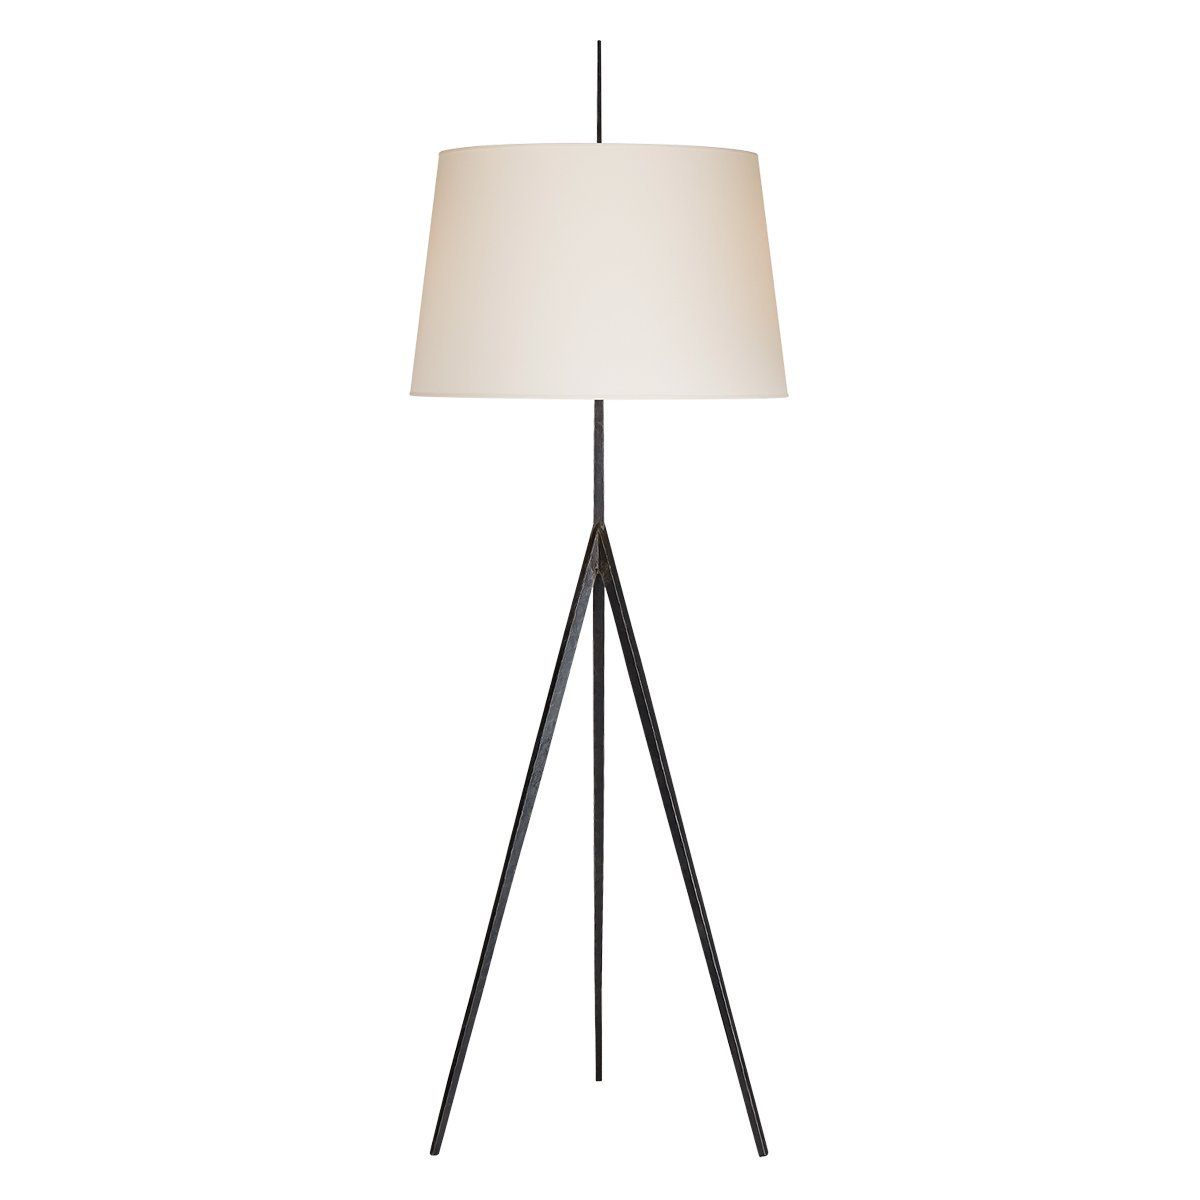 Triad_Hand-Forged_Floor_Lamp_1.jpg